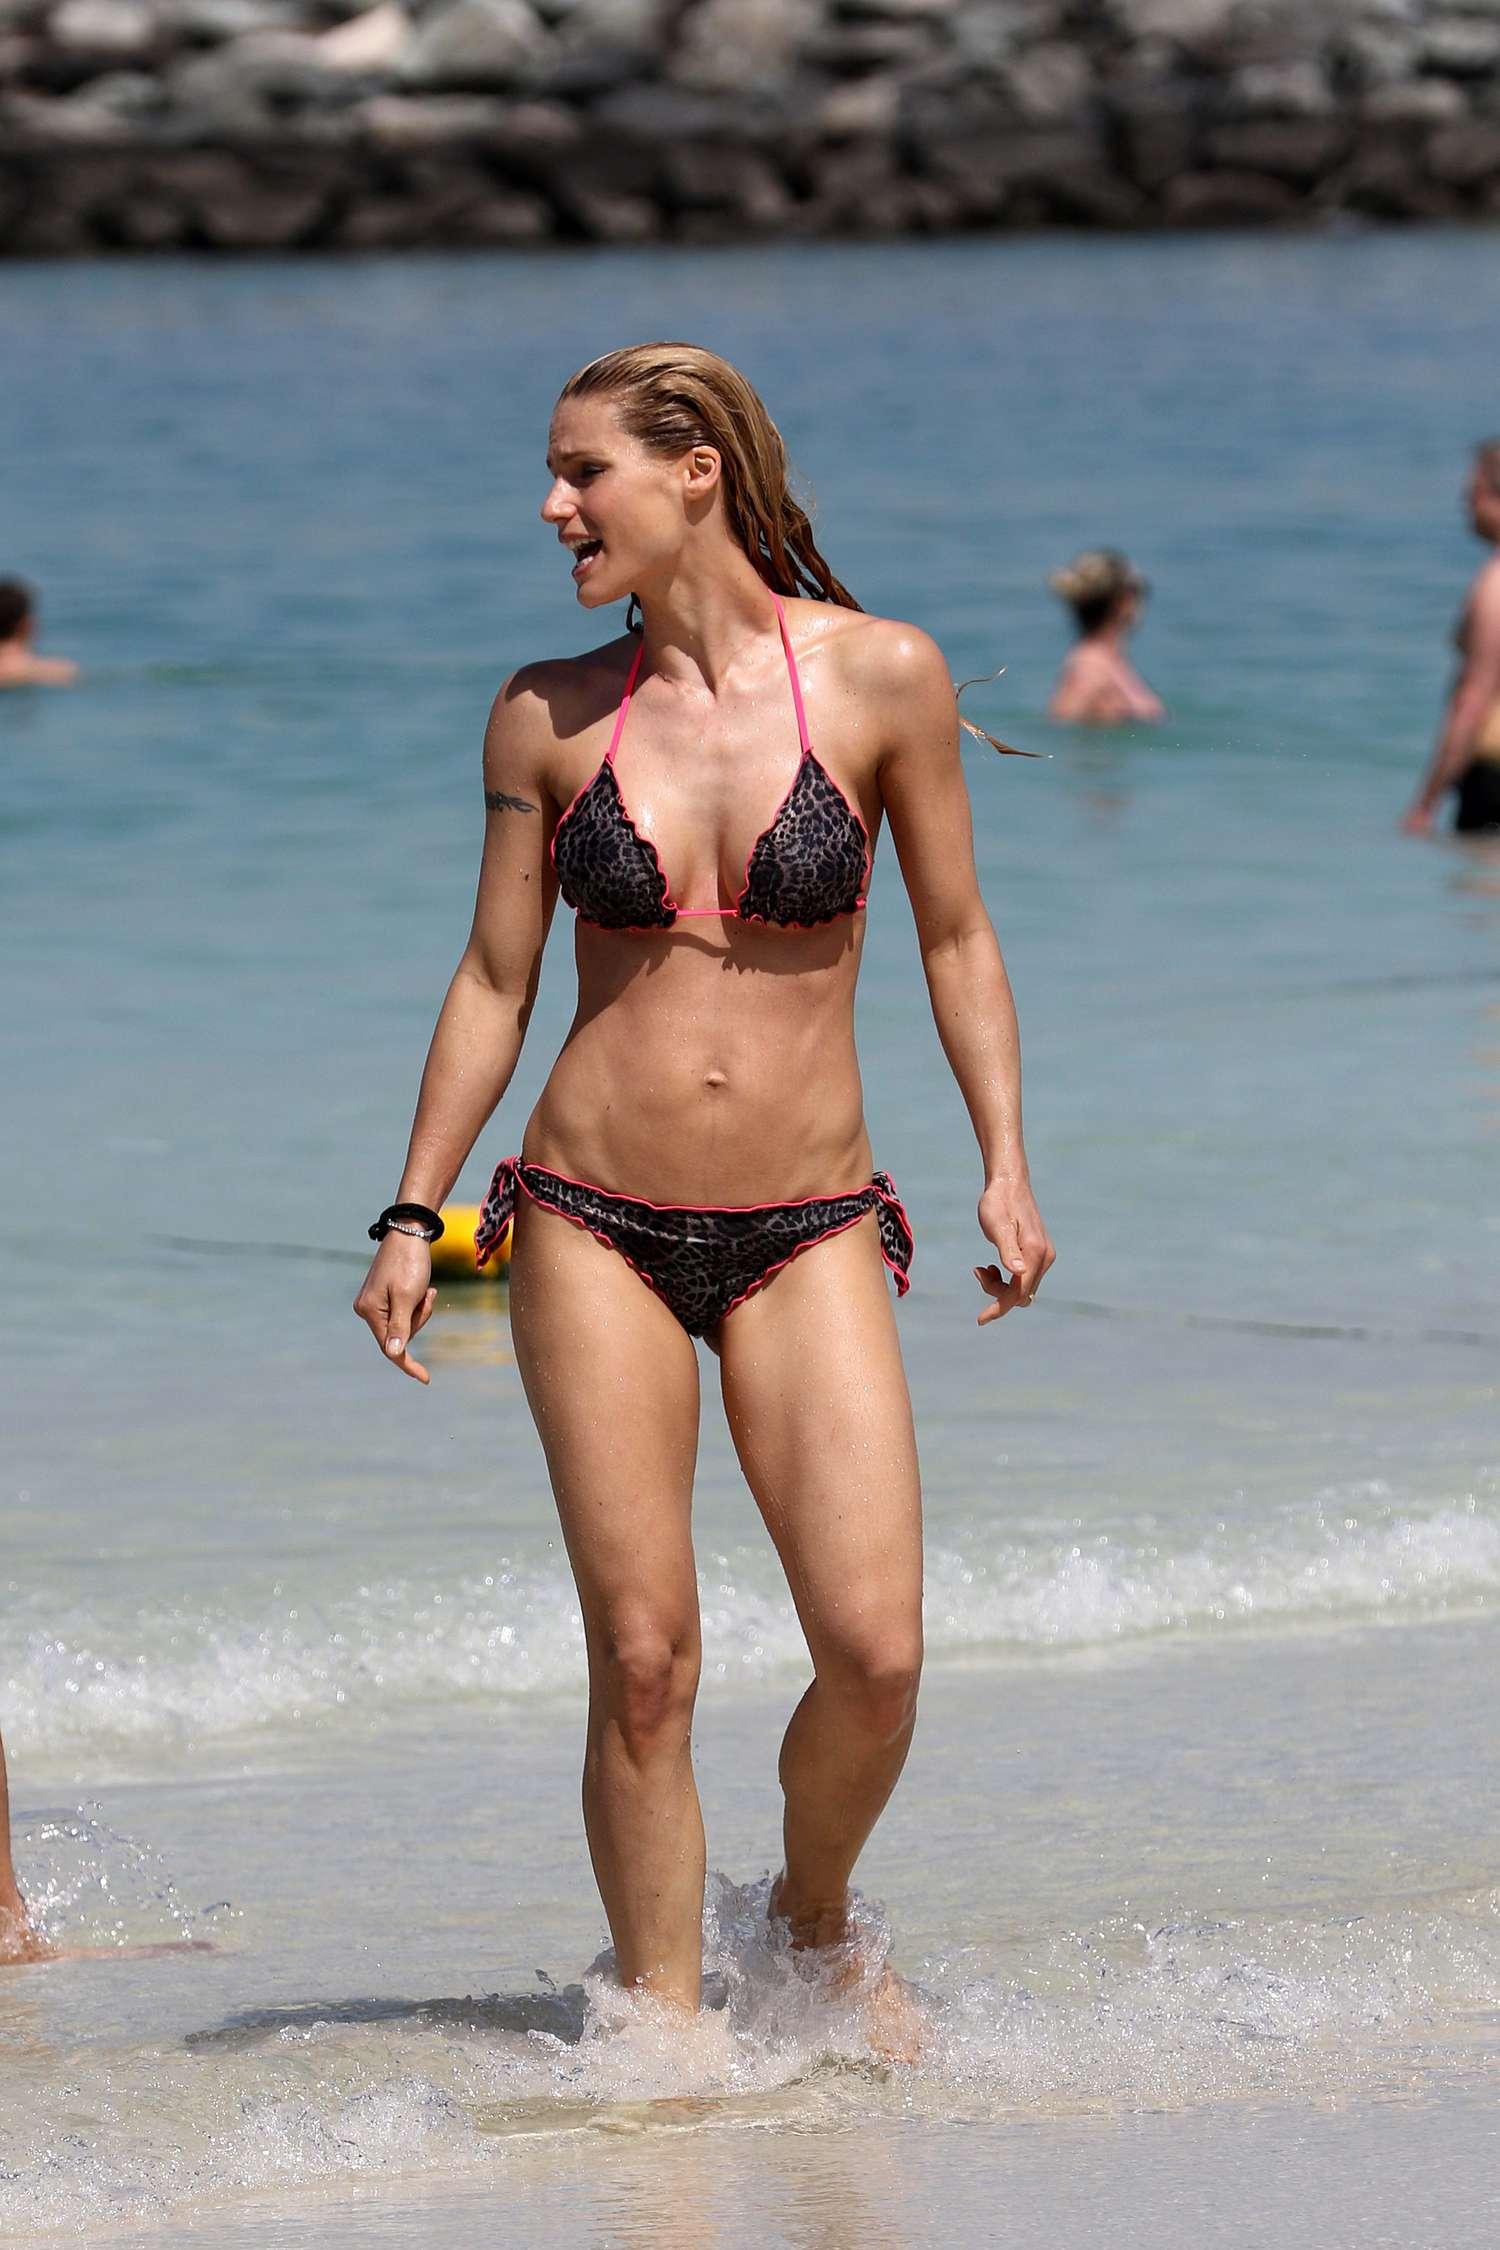 Prevent bikini bump